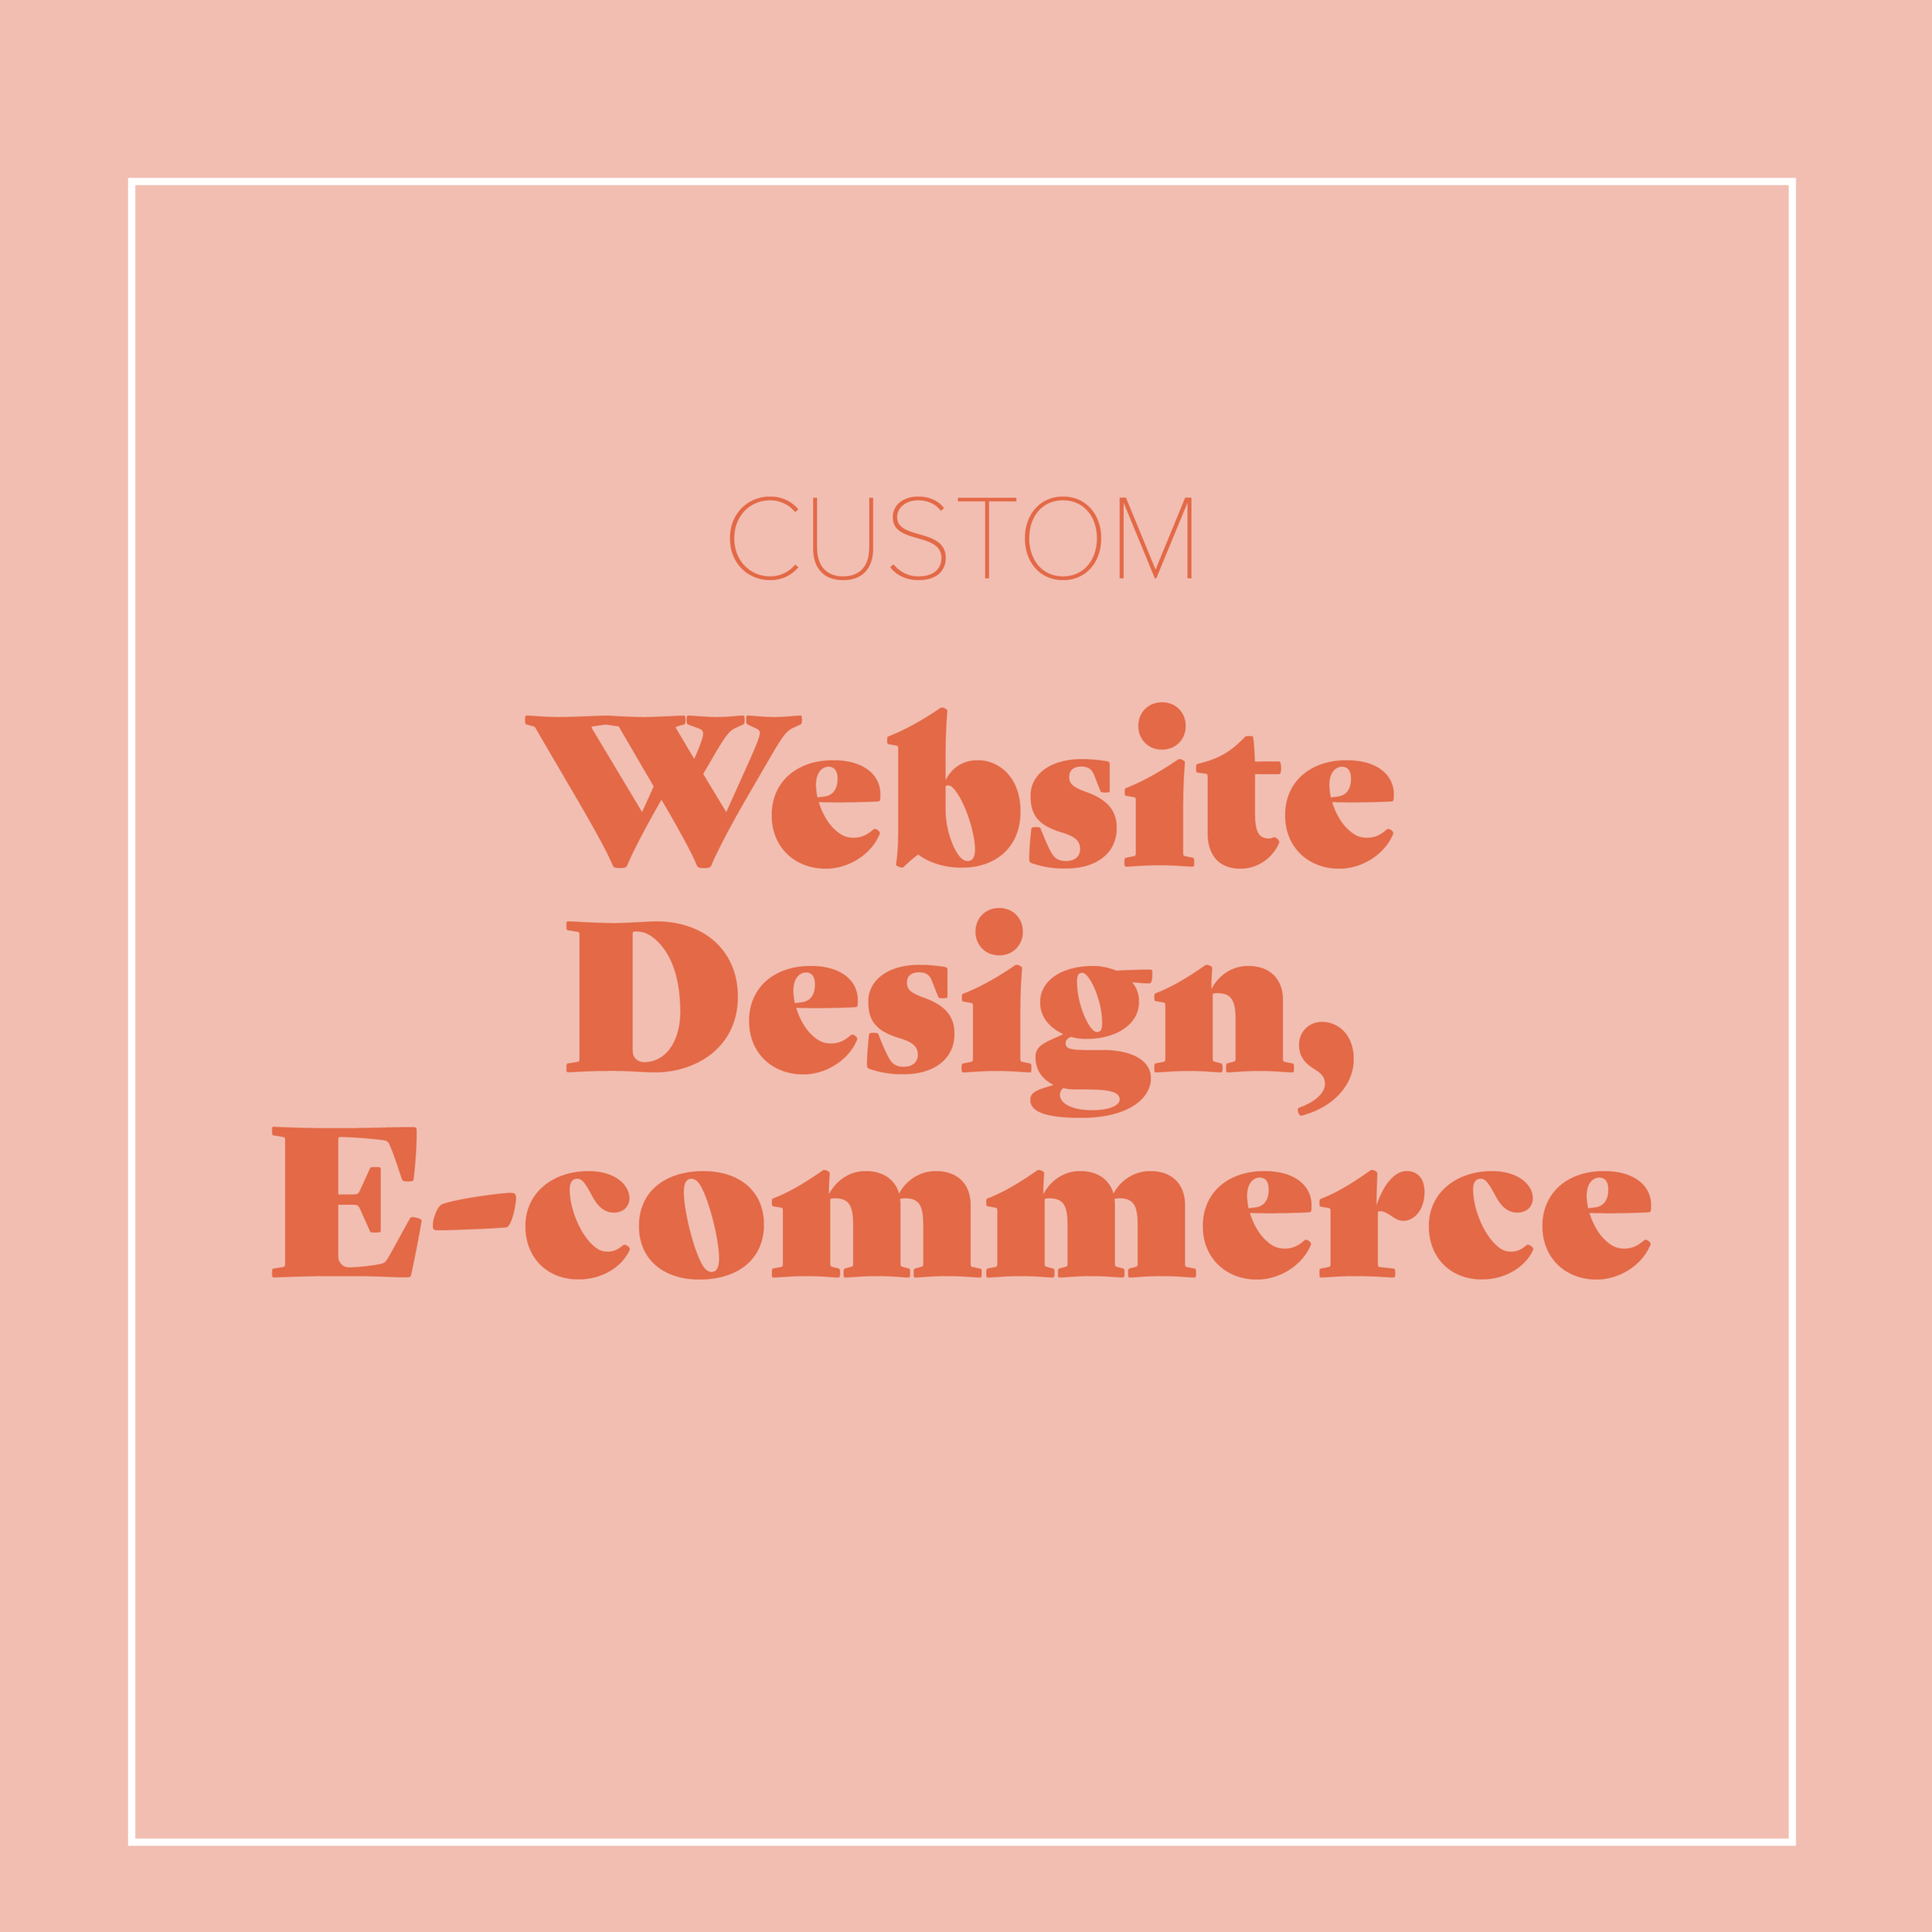 013_websitedesignecommerce_stacyaguilar.png